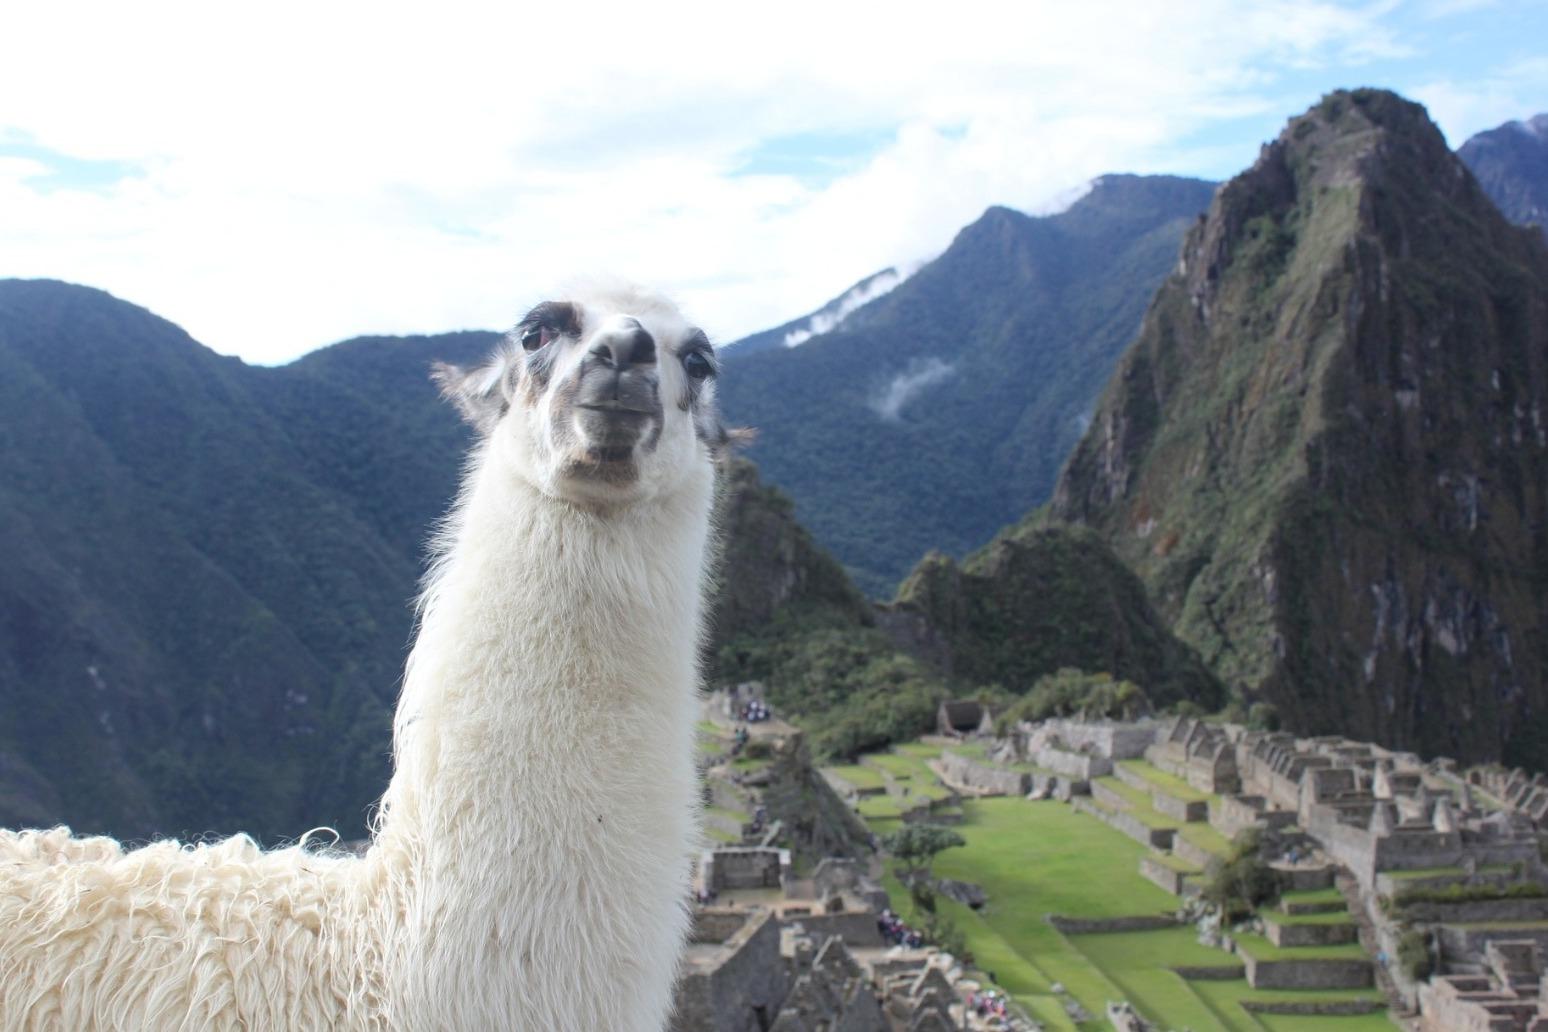 Engineered llama antibodies neutralise coronavirus, study suggests